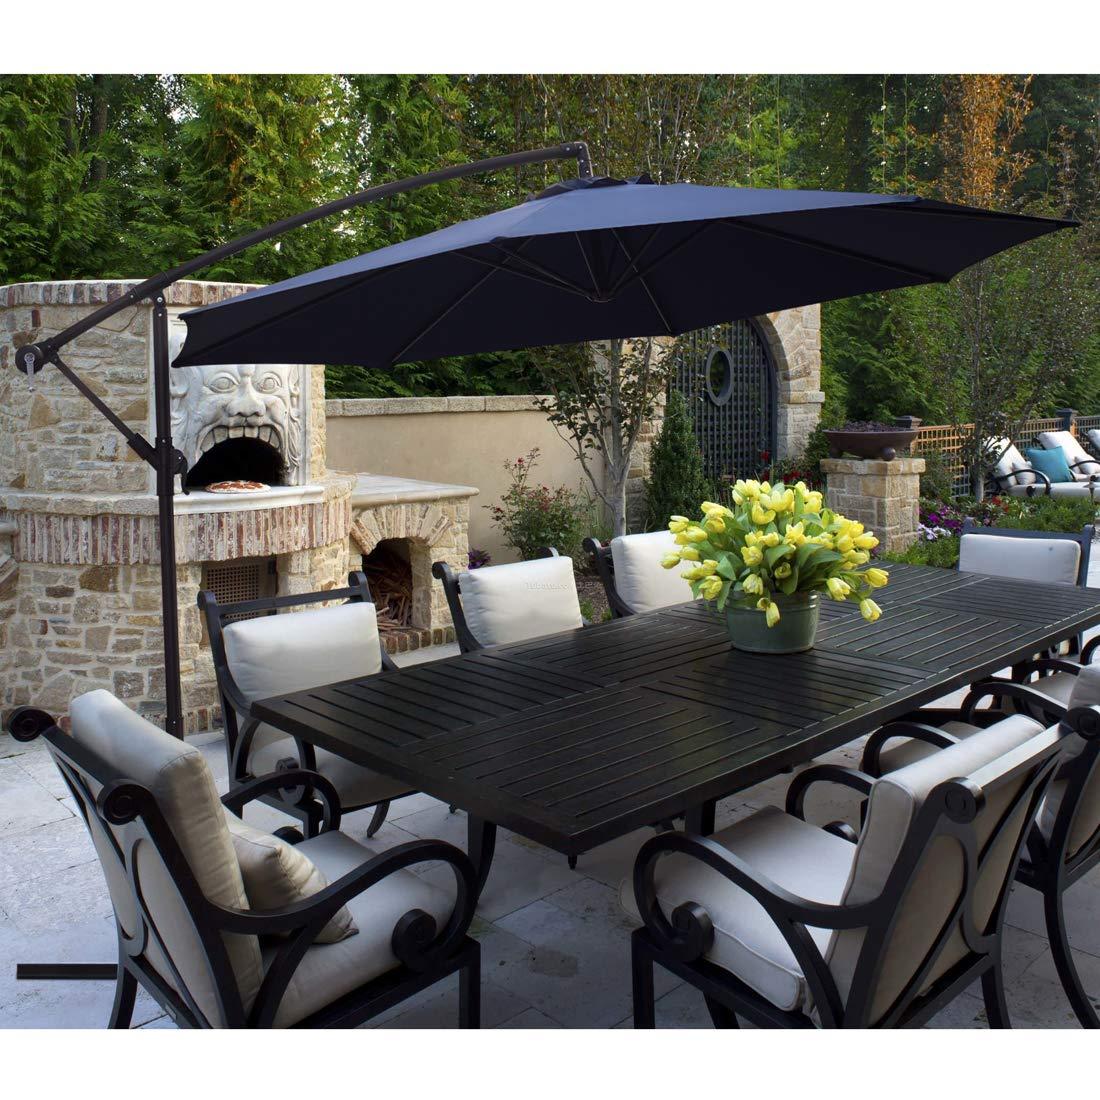 KINGYES 10ft Patio Offset Cantilever Umbrella Market Umbrellas Outdoor Umbrella with Crank & Cross Base for Garden, Deck,Backyard and Pool(Navy Blue) by KINGYES (Image #2)